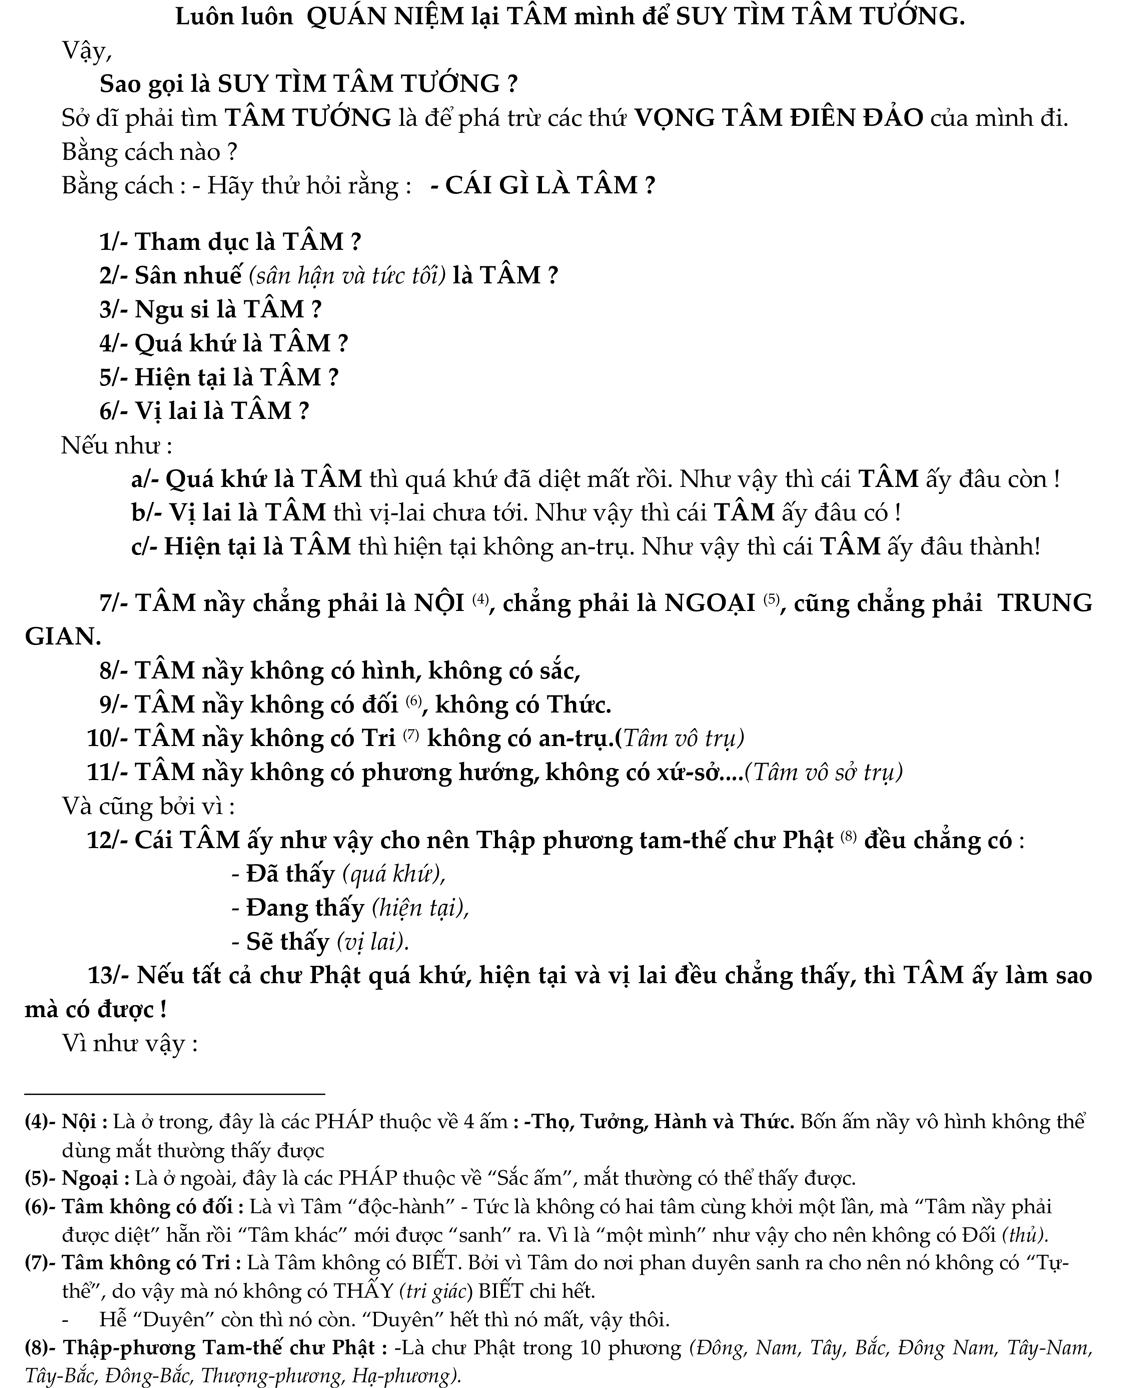 C:\Users\kimtl\Desktop\thu phat hoc hinh\90-6.png